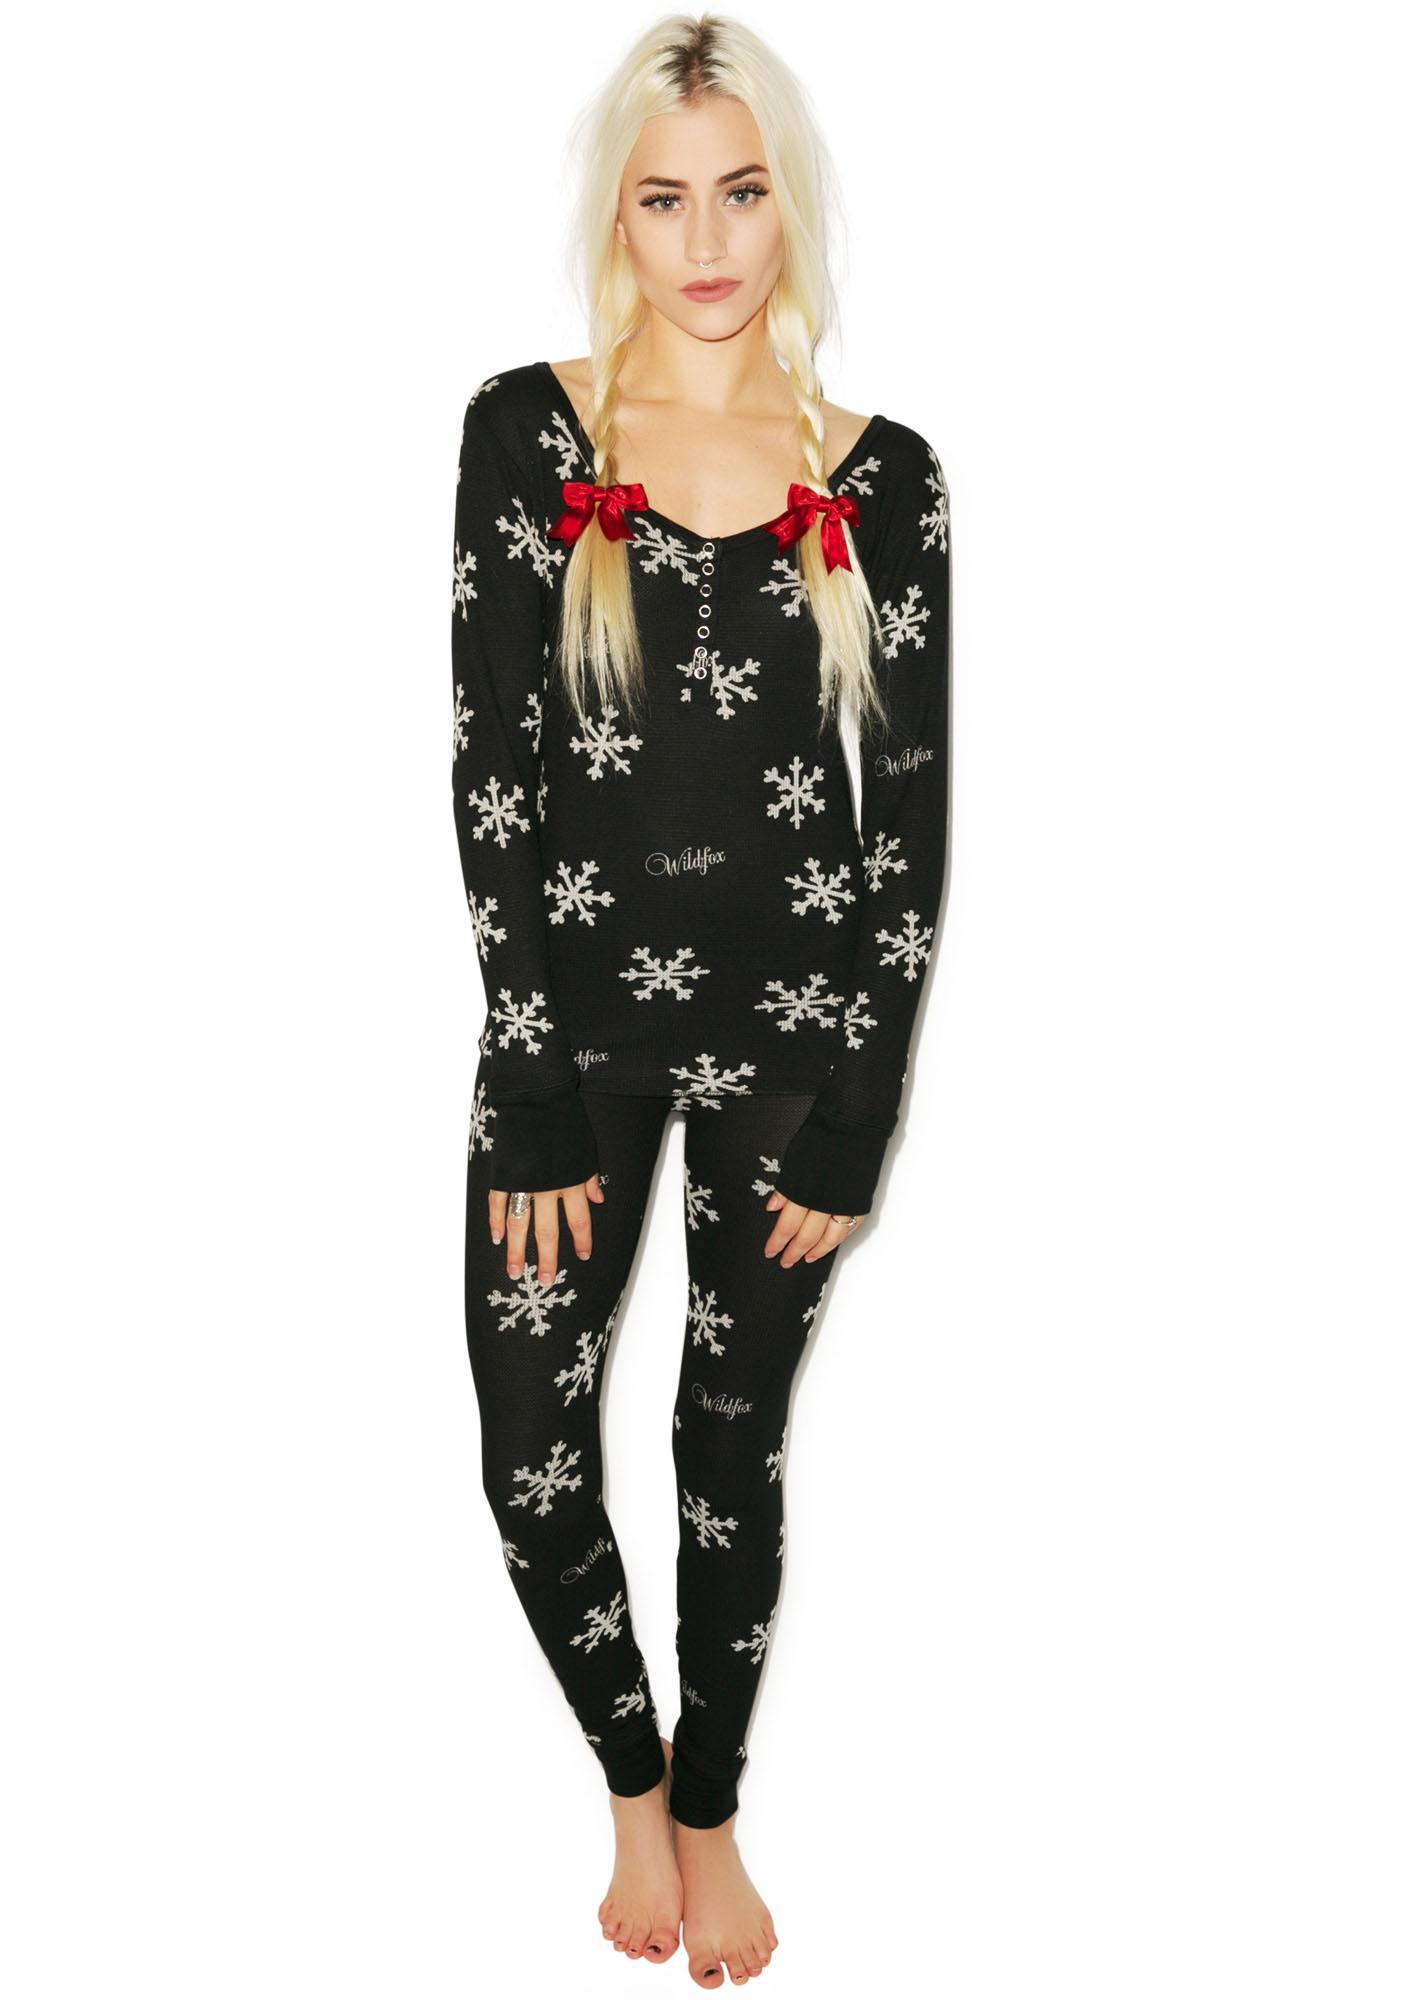 Wildfox Couture Snowflake Ski Bunny Pajama Set  5d2666541